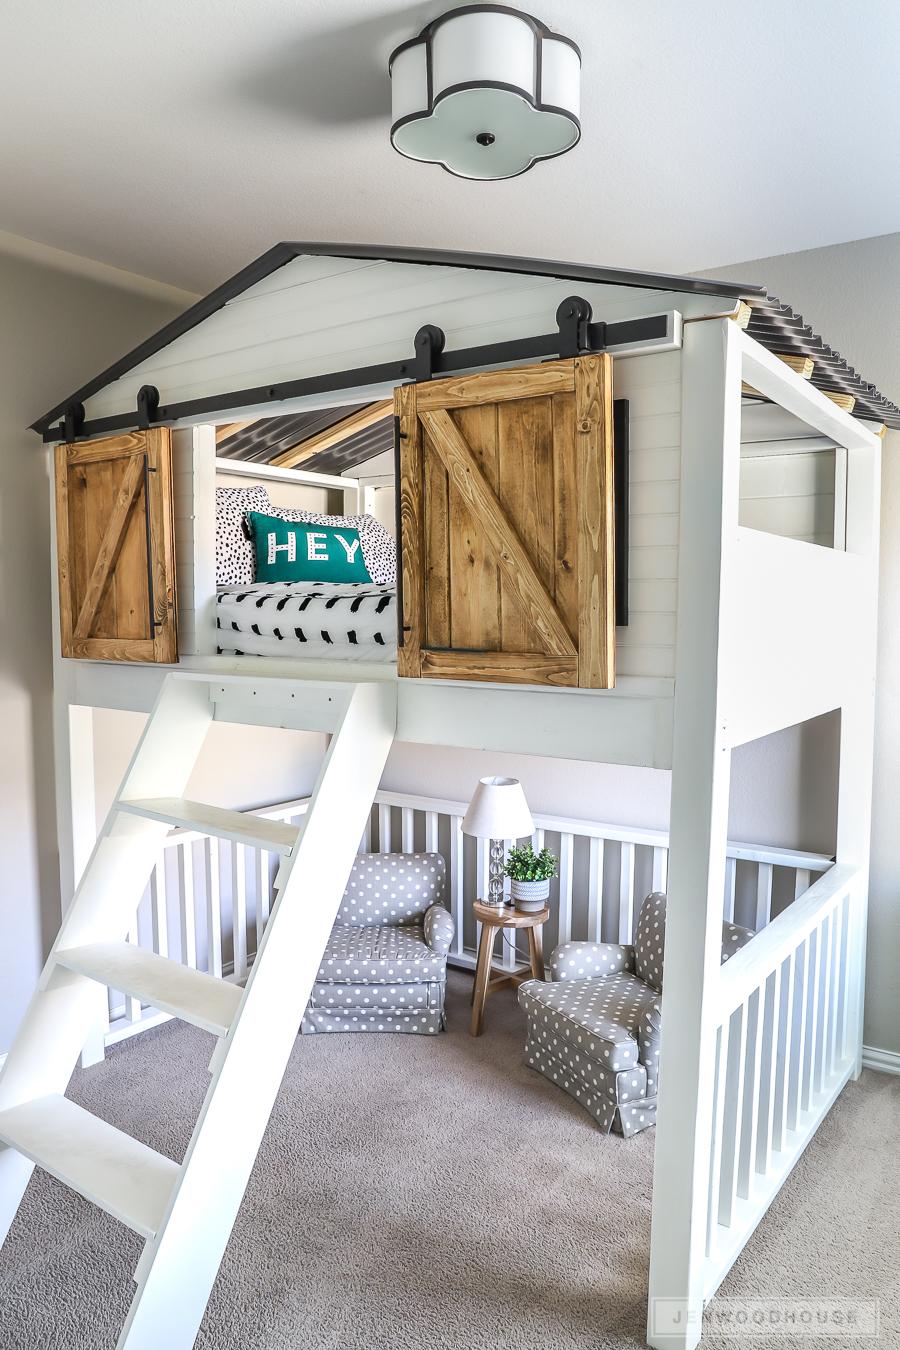 Loft beds, how to build a DIY loft bed with sliding doors KPQJOTA